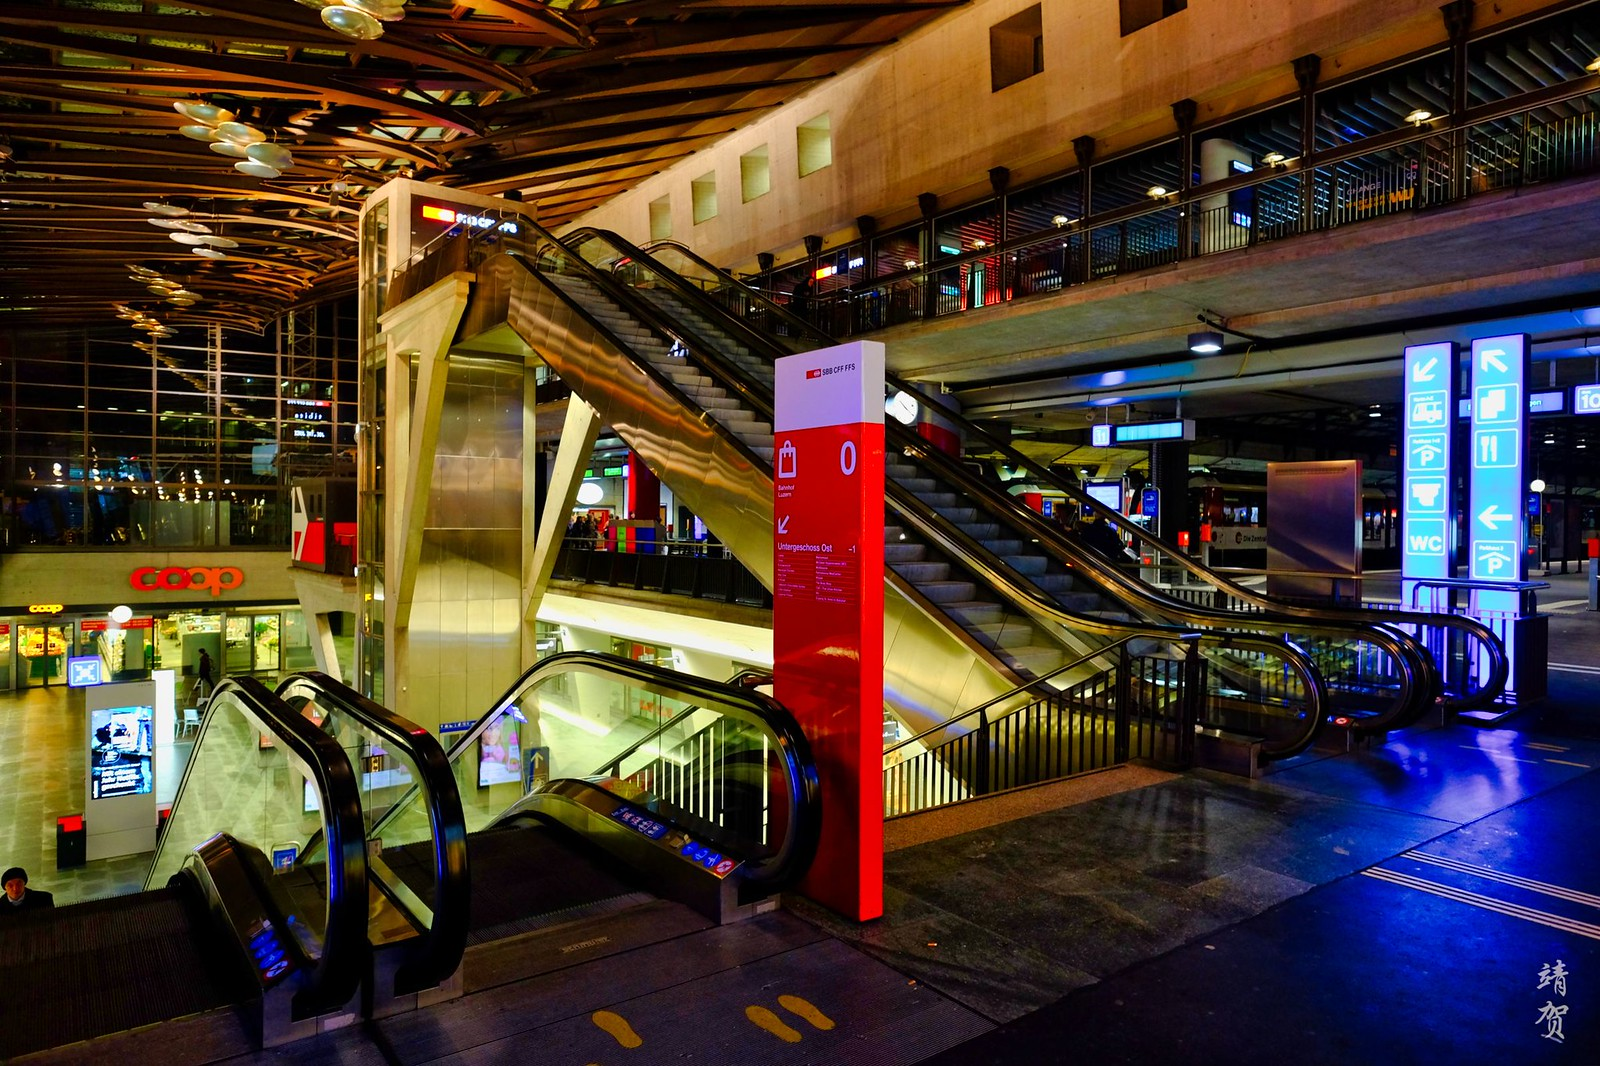 Train station atrium